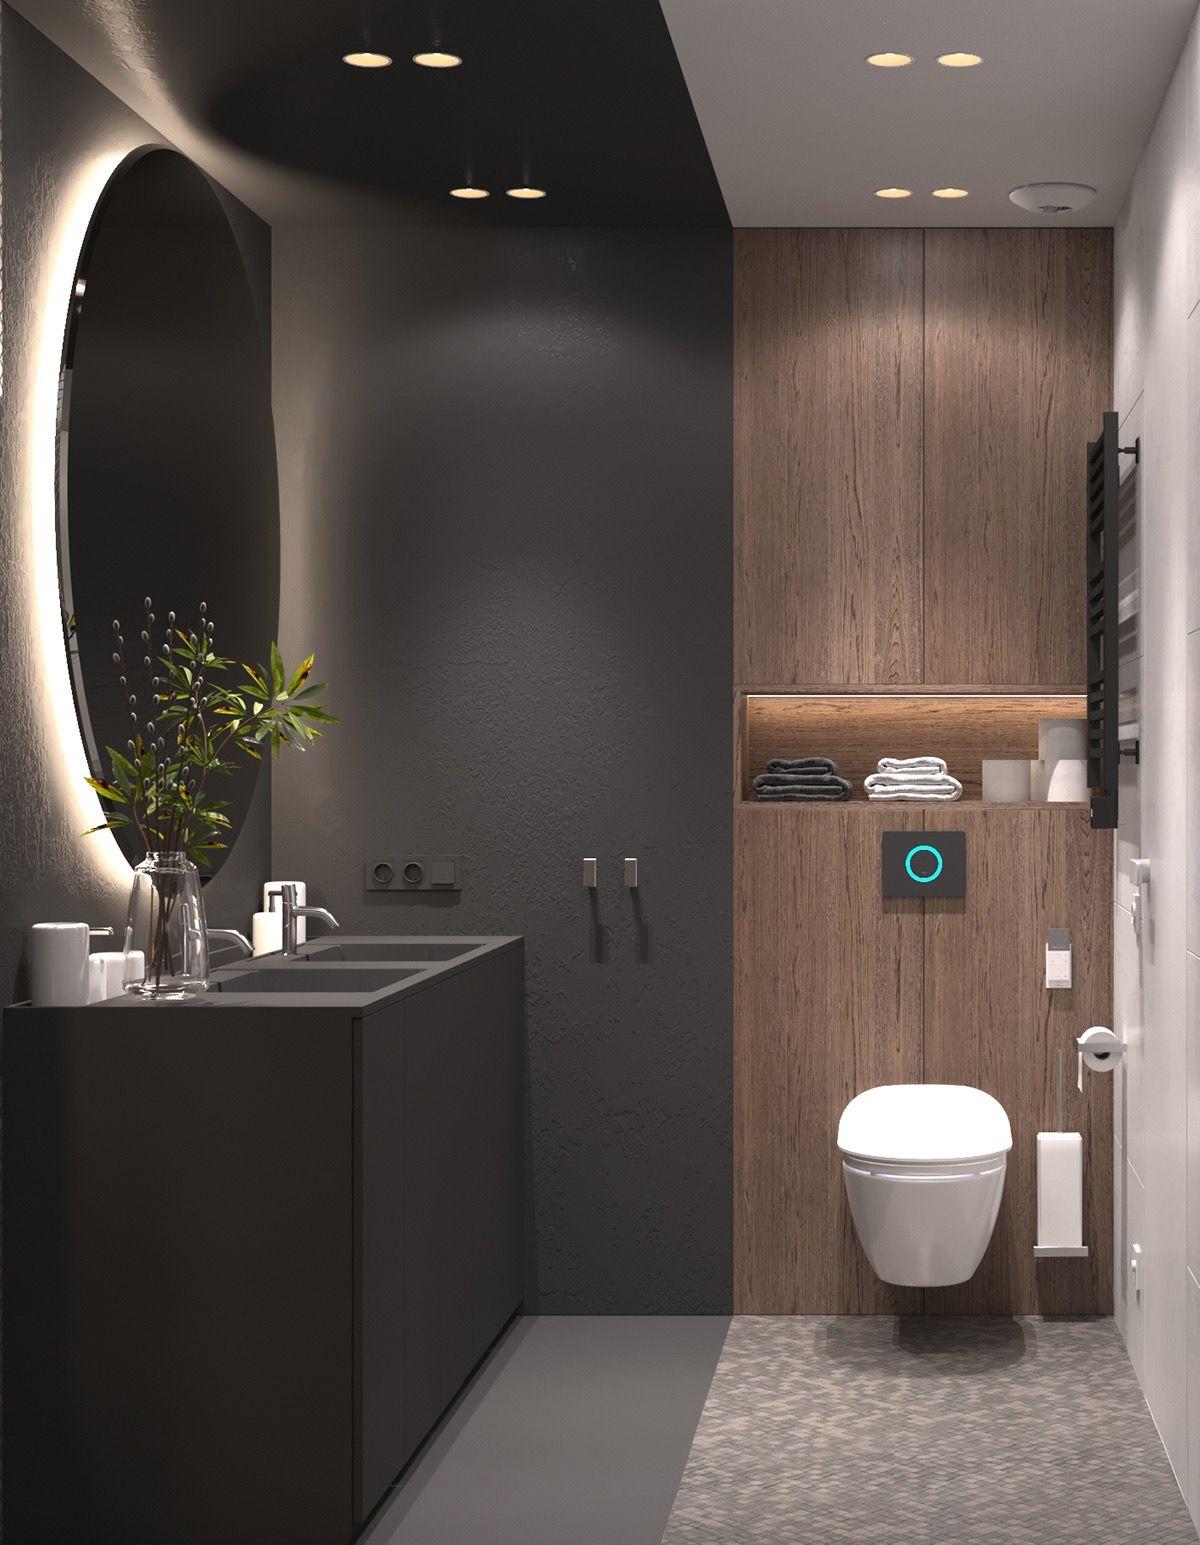 Warm Interior Design With A Soft Lighting Scheme Top Bathroom Design Bathroom Interior Design Bathroom Design Small